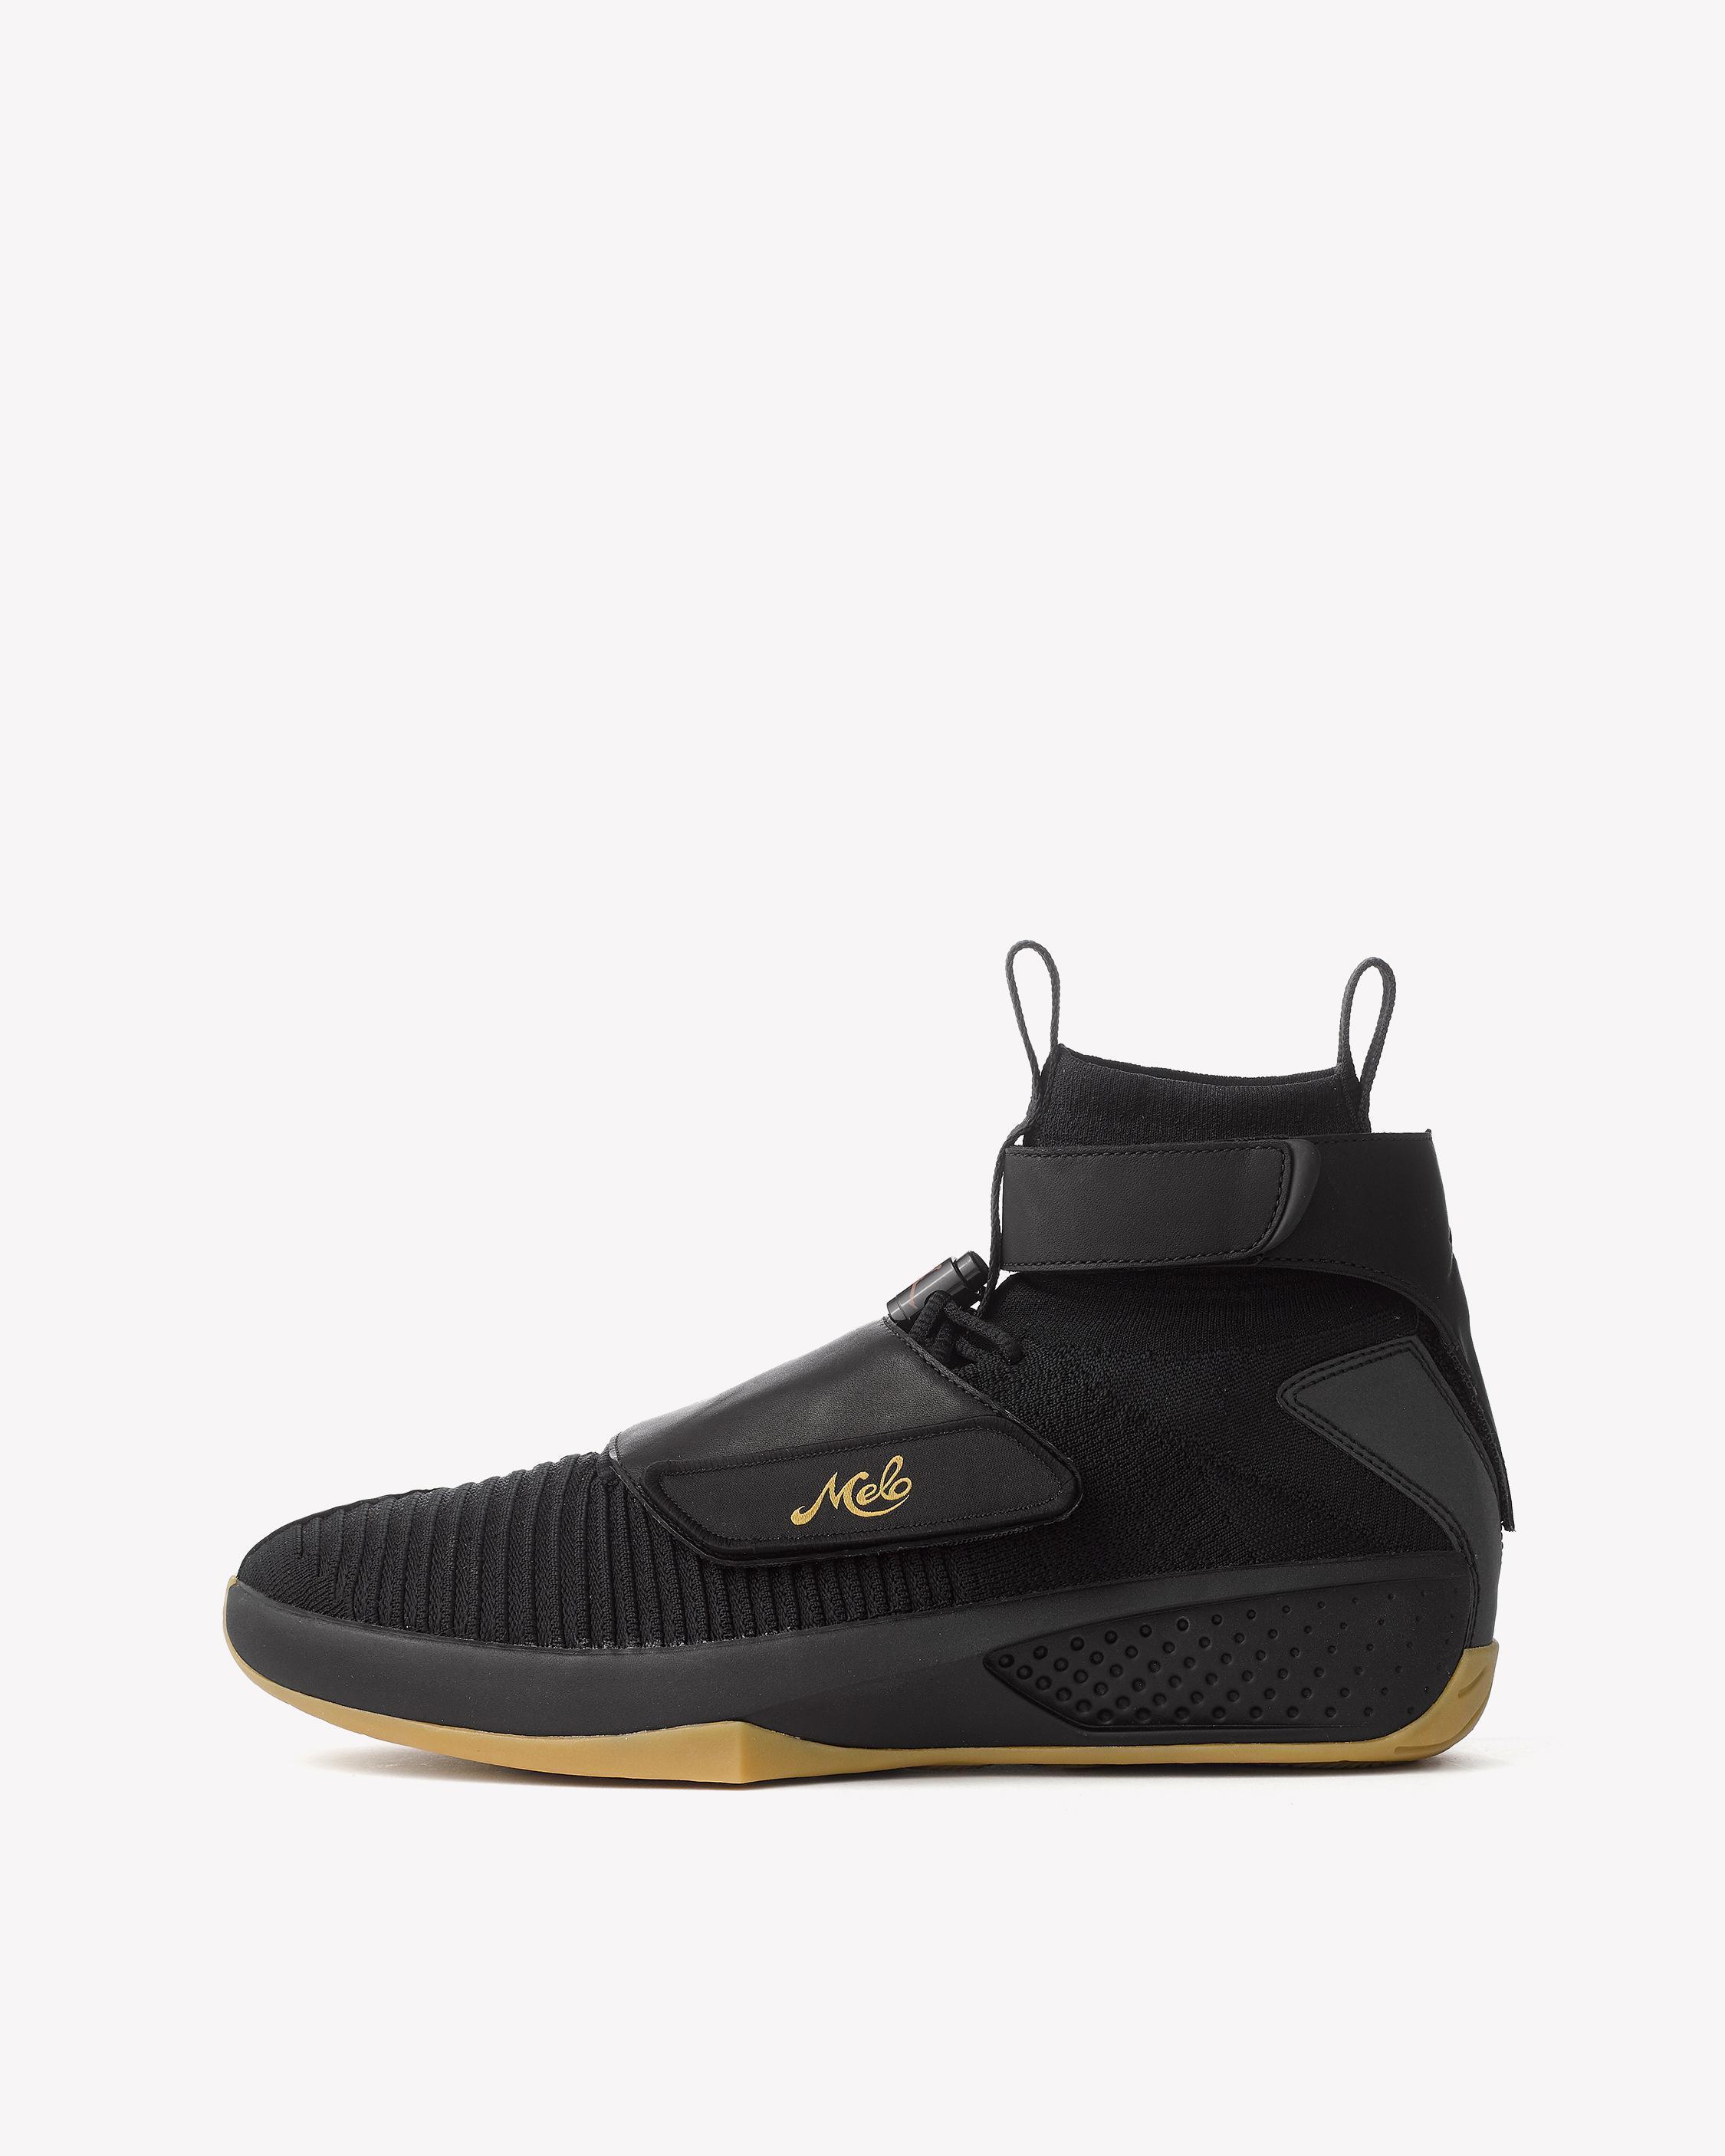 e9dcdfb33867 Lyst - Rag   Bone Air Jordan Xx Flyknit in Black for Men